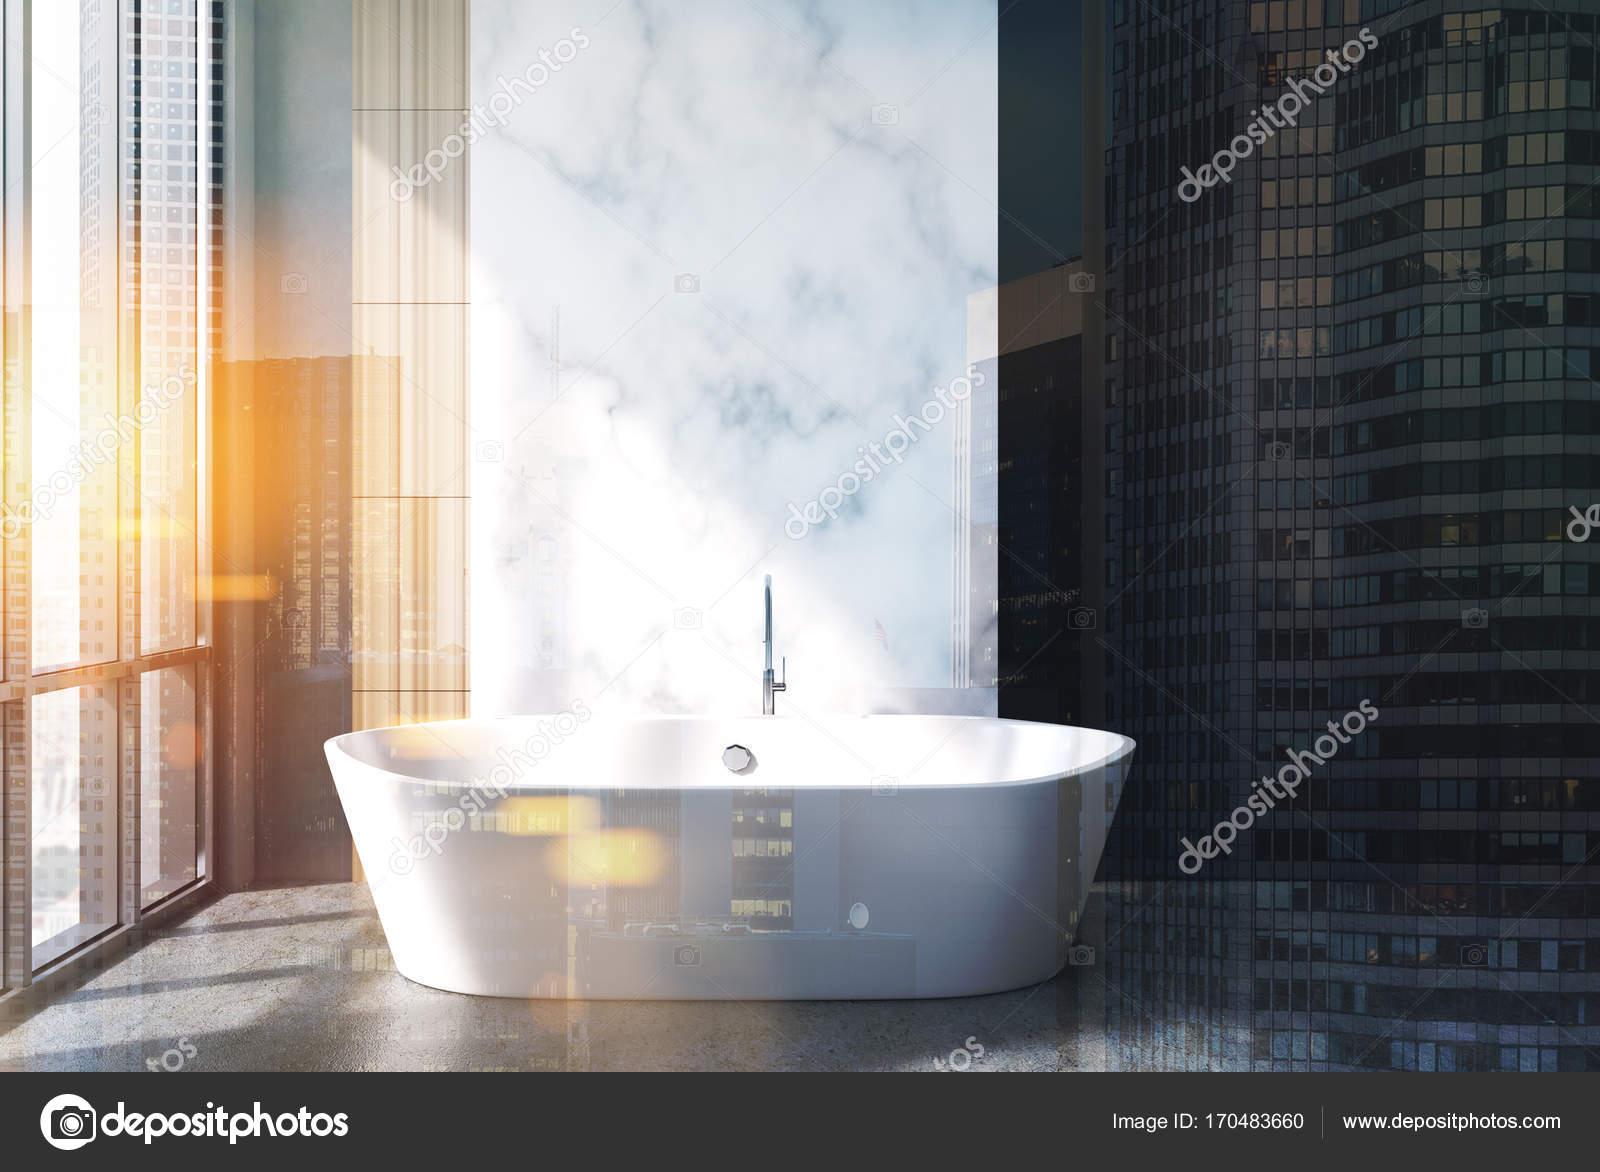 Vasca Da Bagno Doppia : Marmo e vasca da bagno vasca doppia u2014 foto stock © denisismagilov